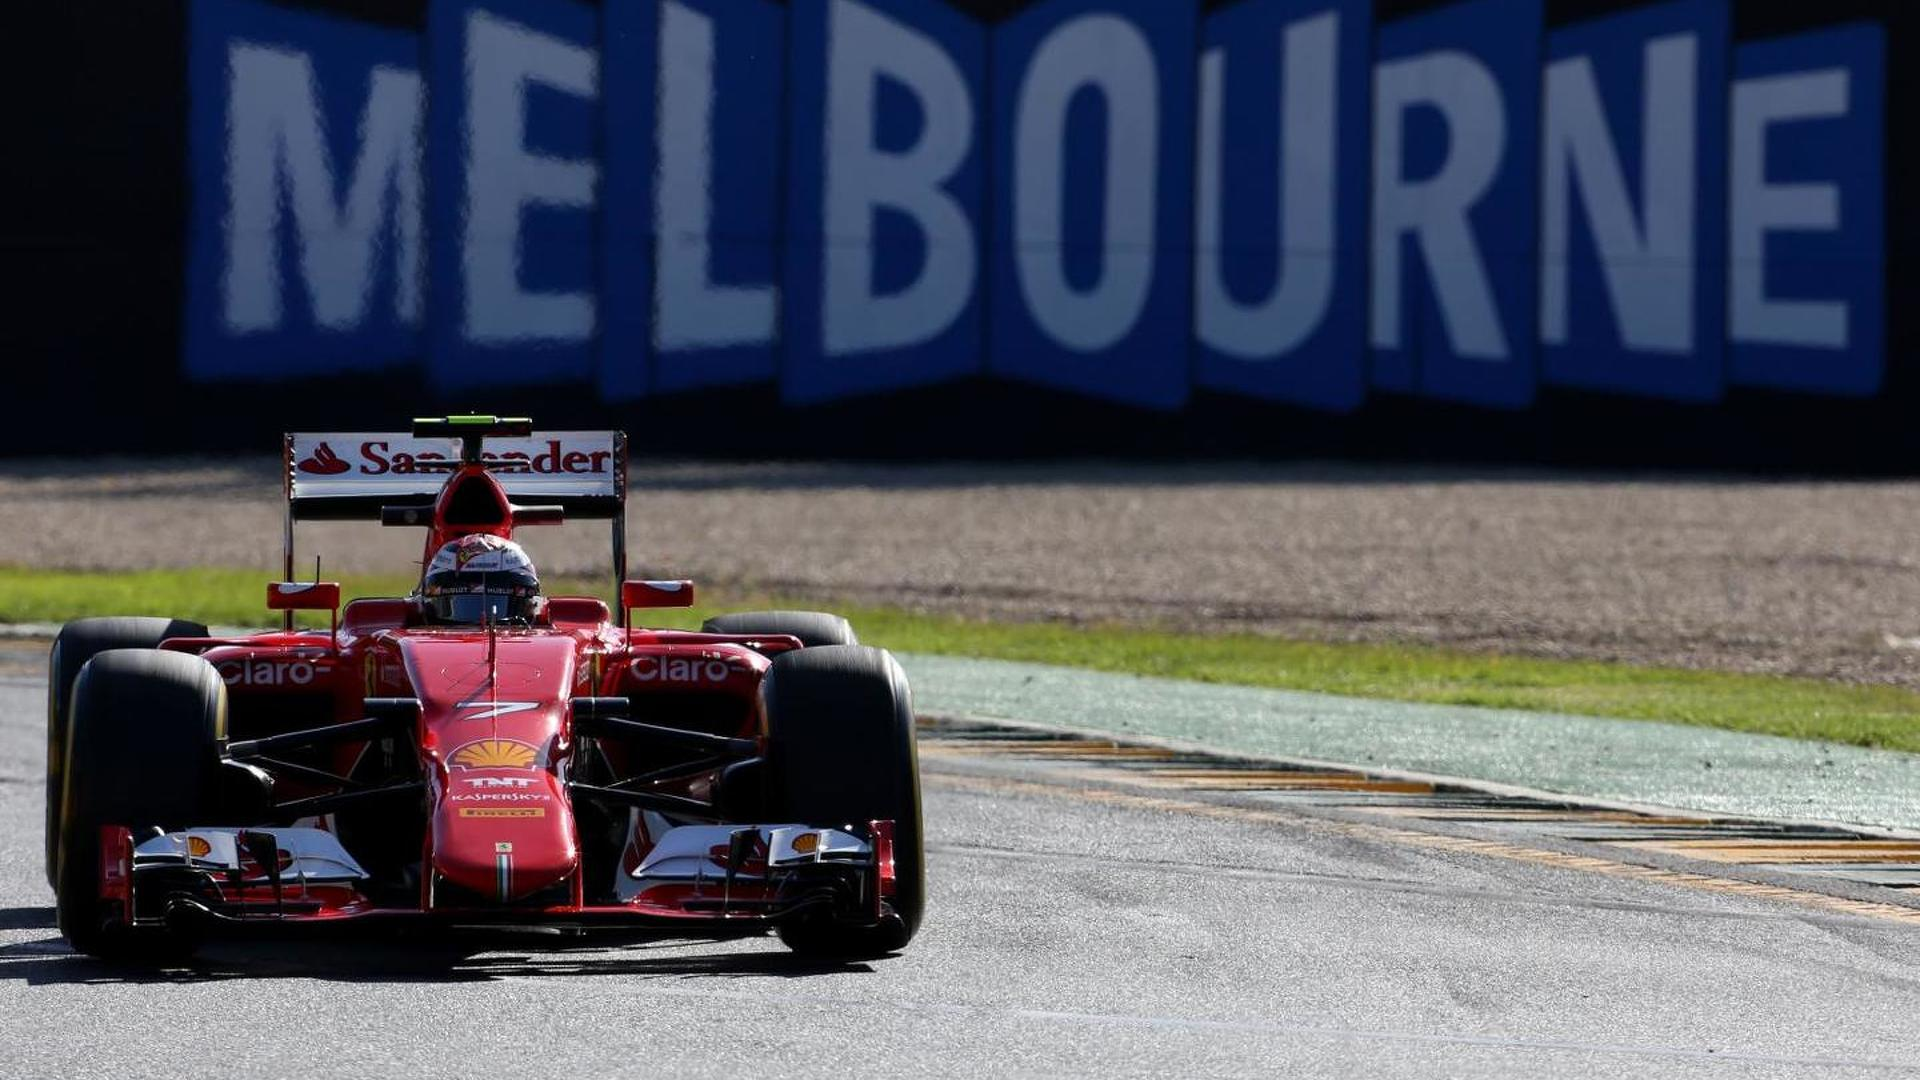 Race pace gap to Mercedes not huge - Raikkonen